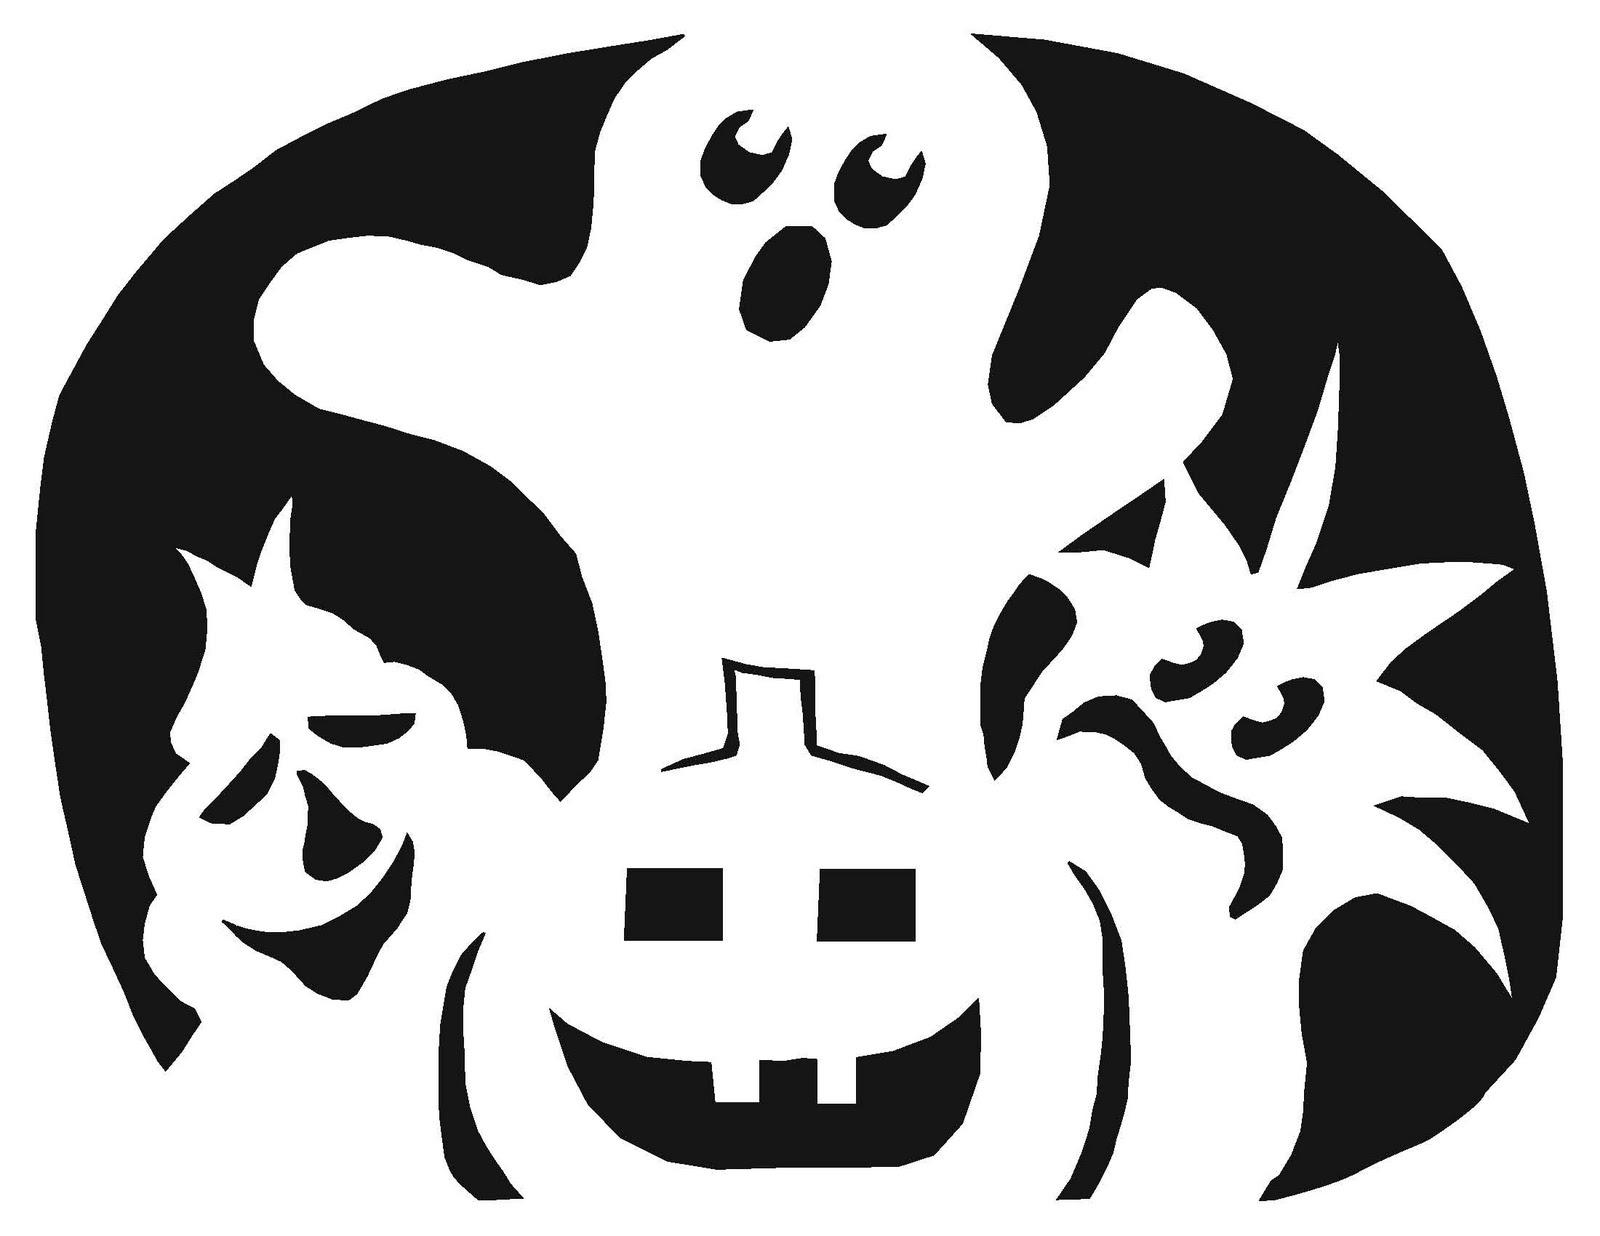 Free Guitar Pumpkin Stencil, Download Free Clip Art, Free Clip Art - Free Pumpkin Carving Templates Printable